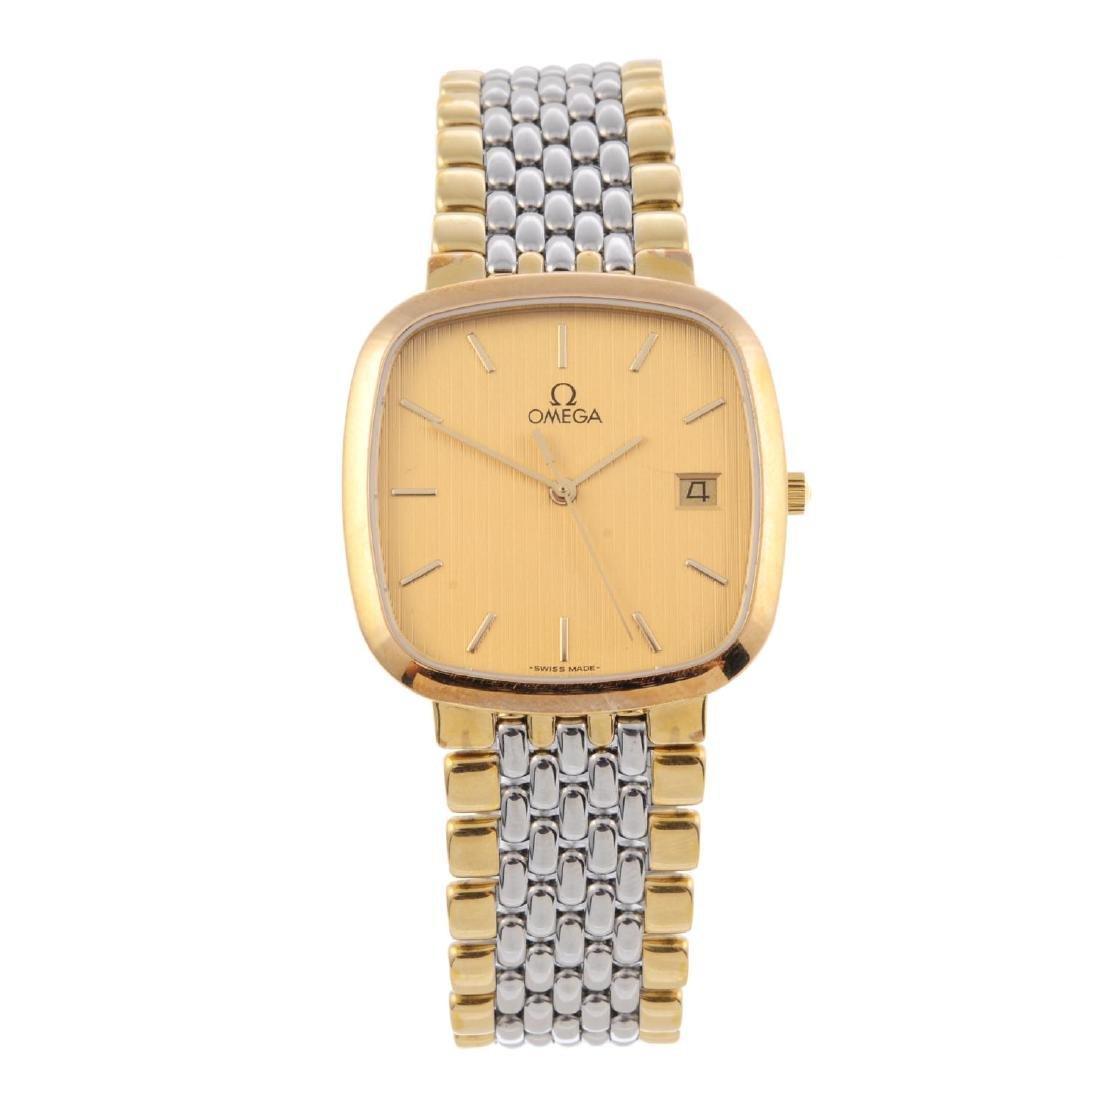 OMEGA - a gentleman's De Ville bracelet watch.